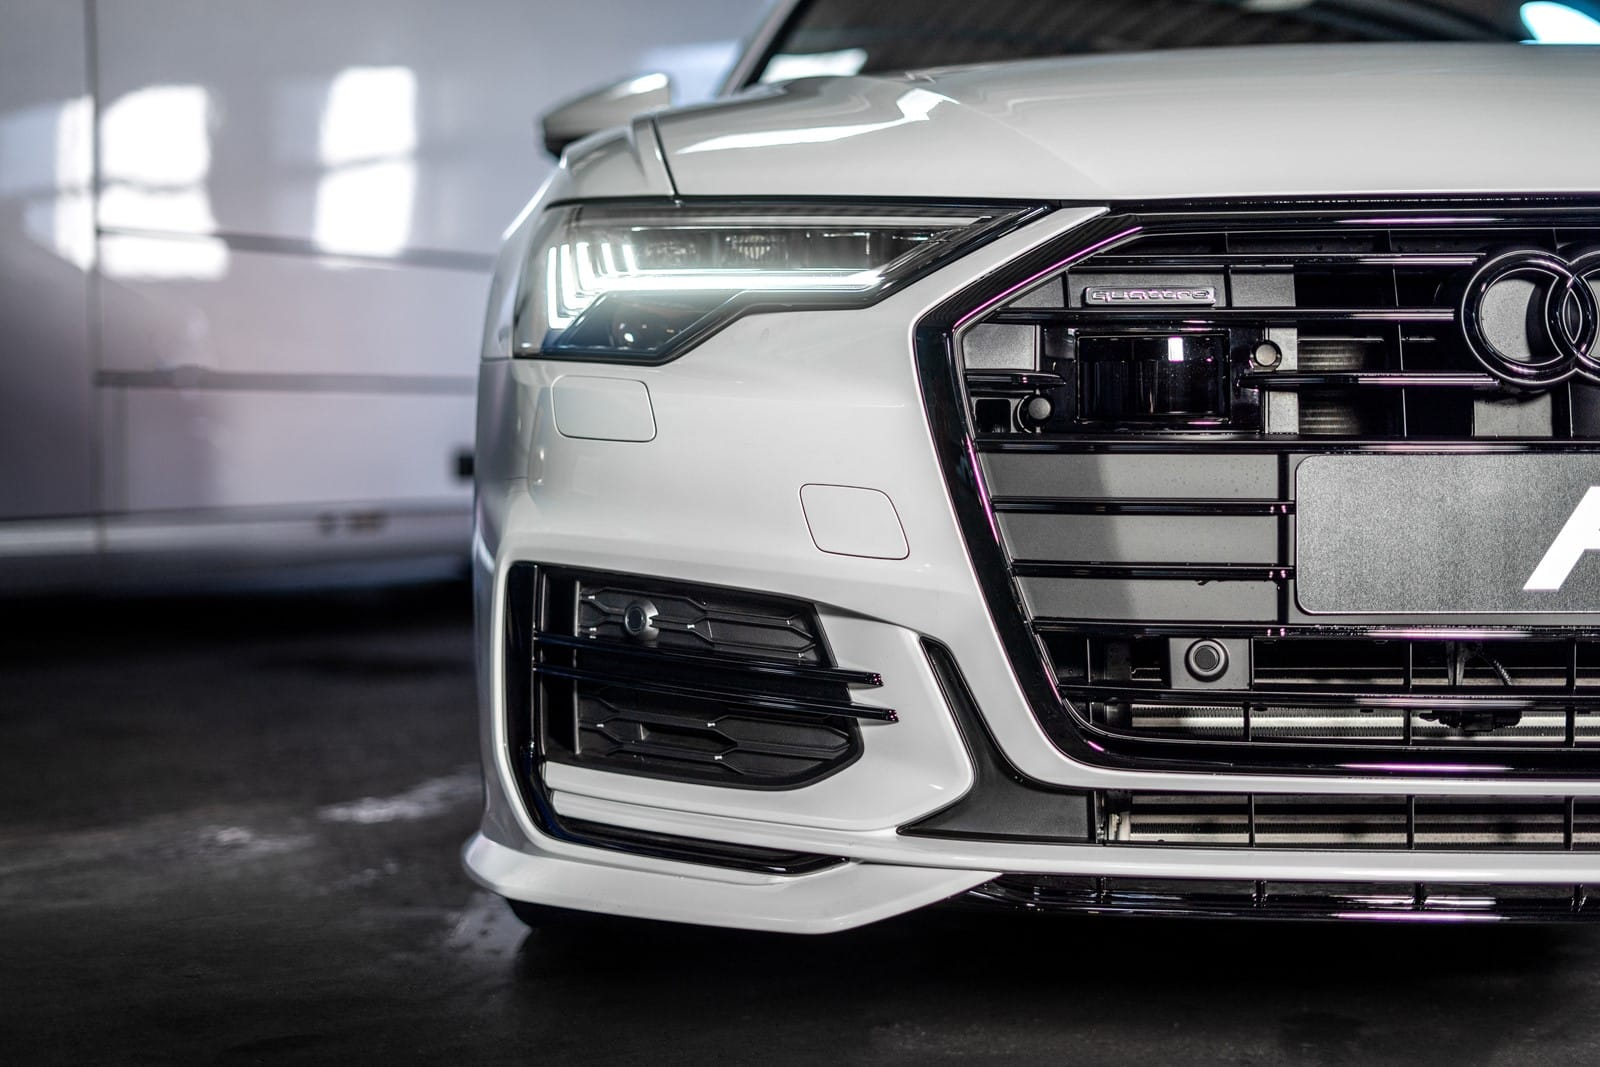 Audi-A6-Avant-ABT-aero-package-6.jpg